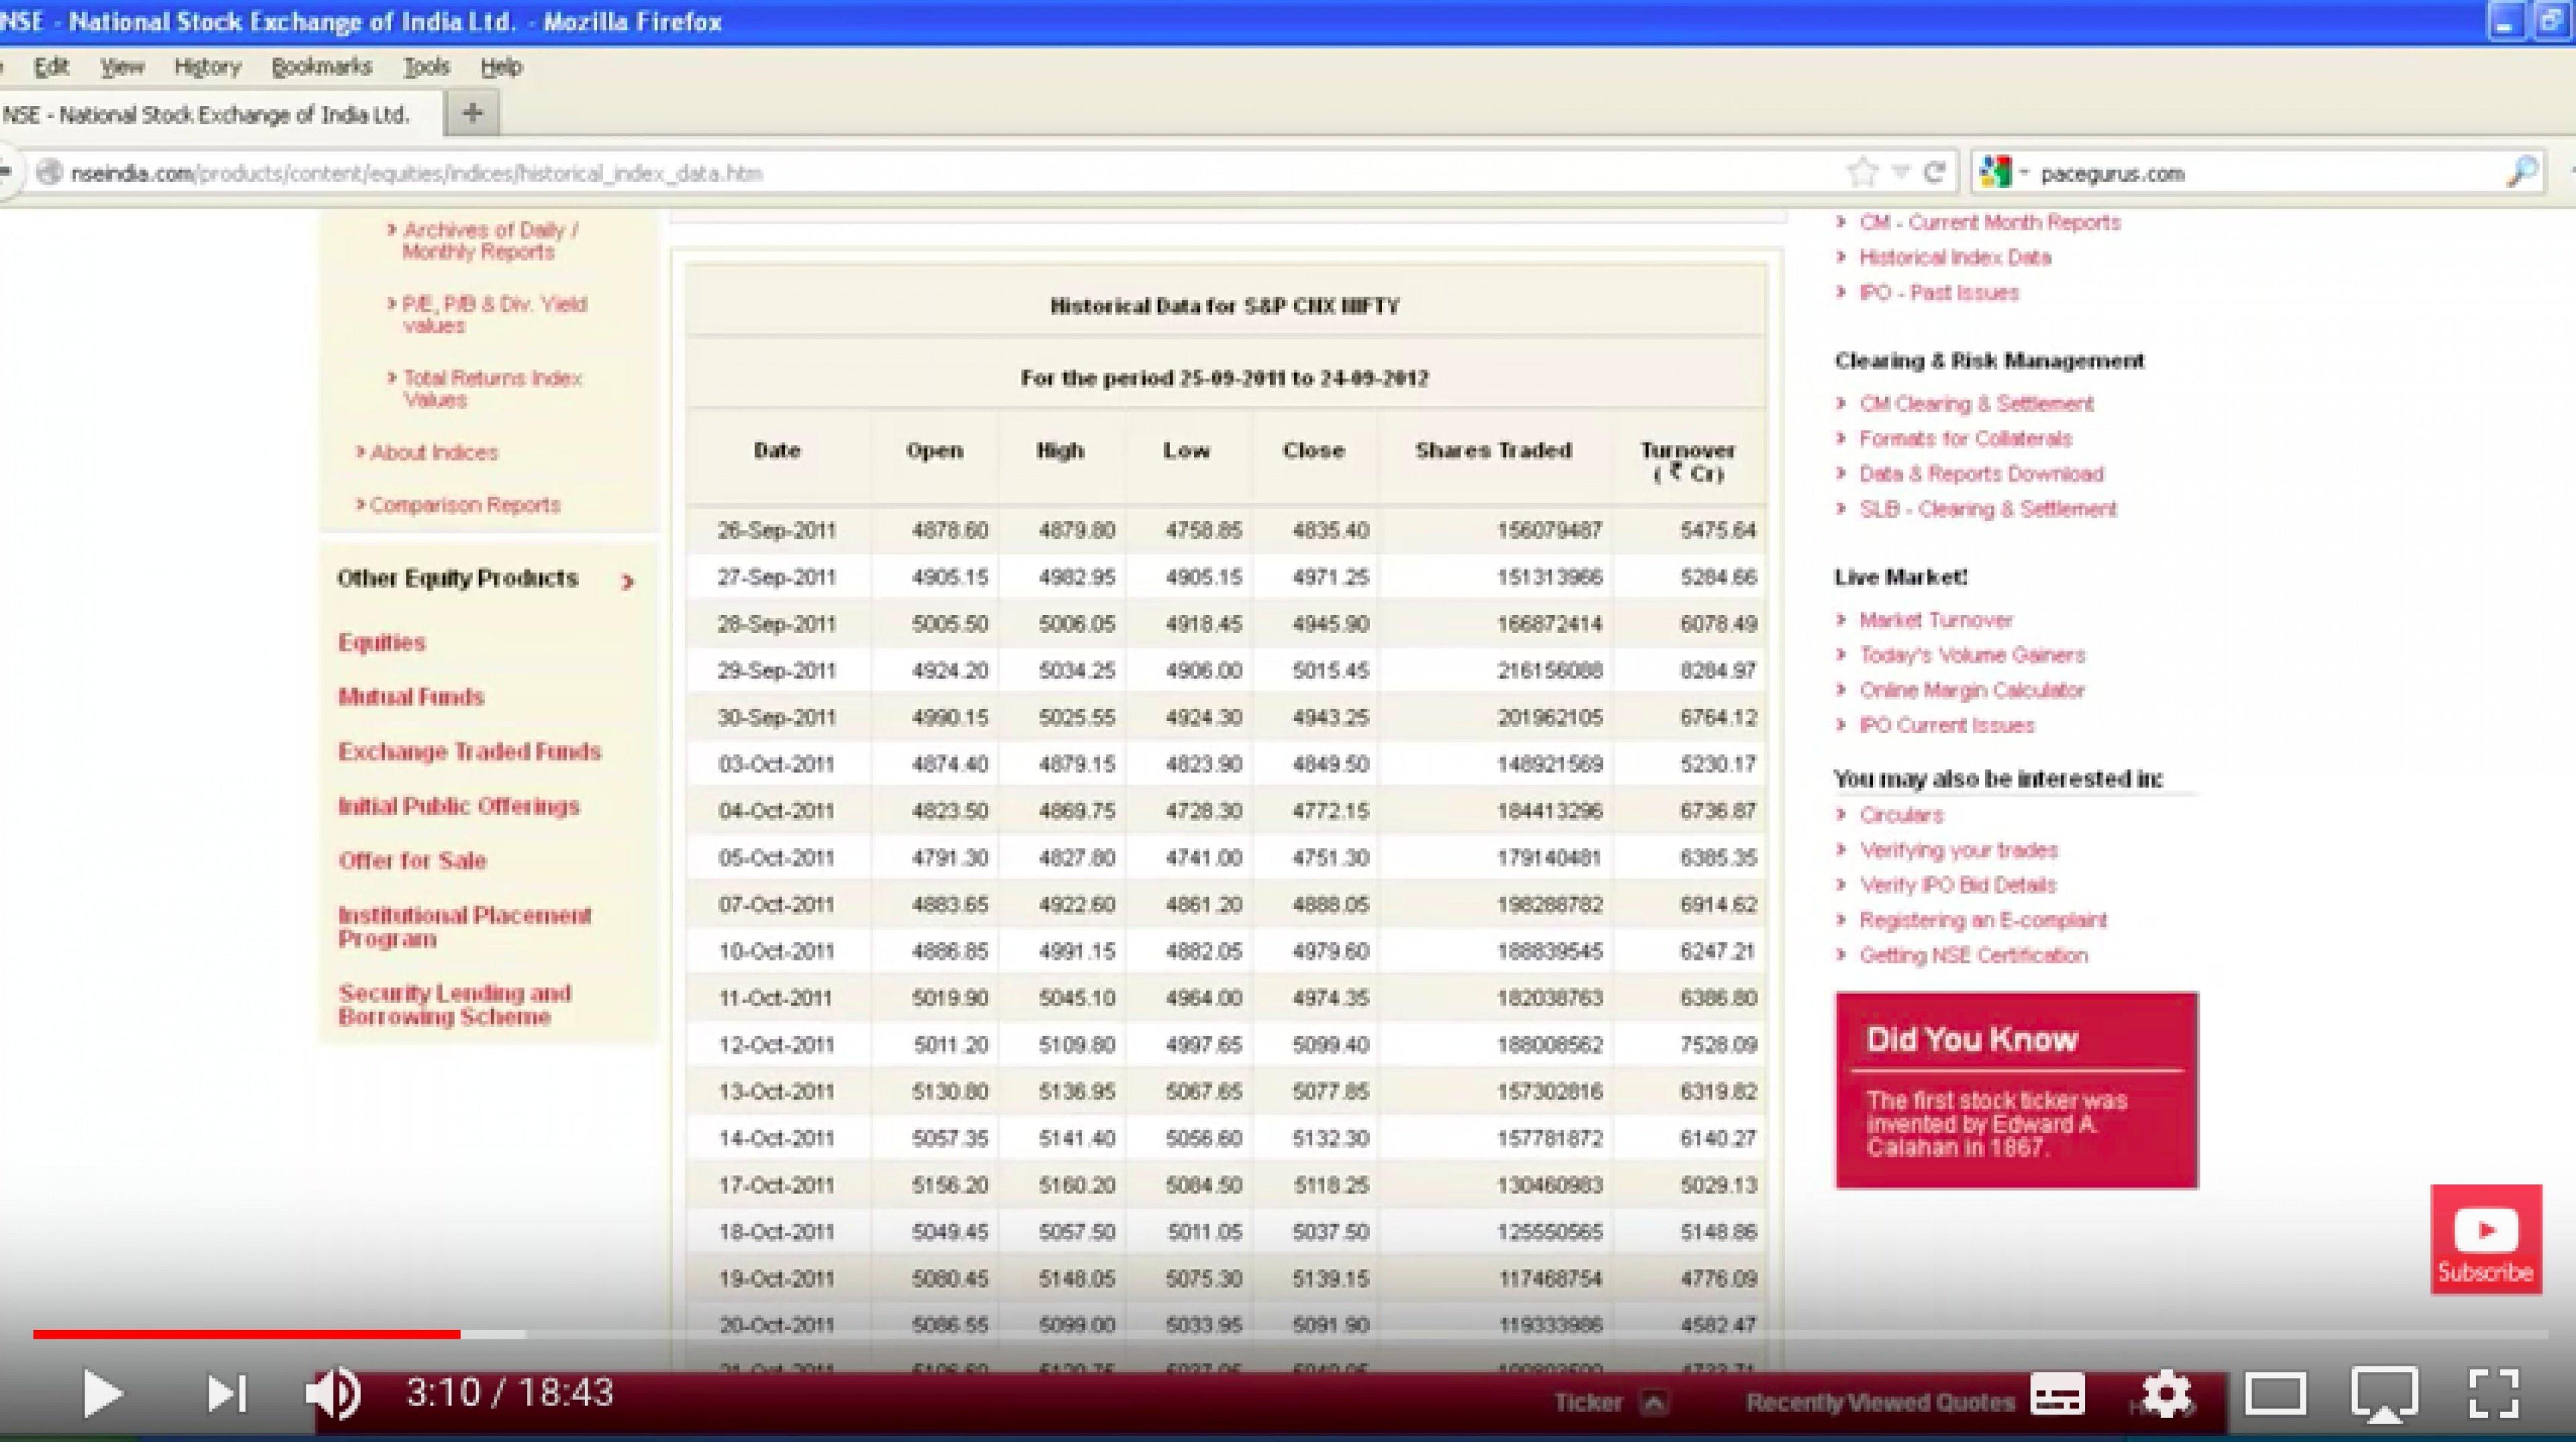 Holiday Calculator Spreadsheet Inside Microsoft Works Spreadsheet Lovely Spreadsheet Type Holiday